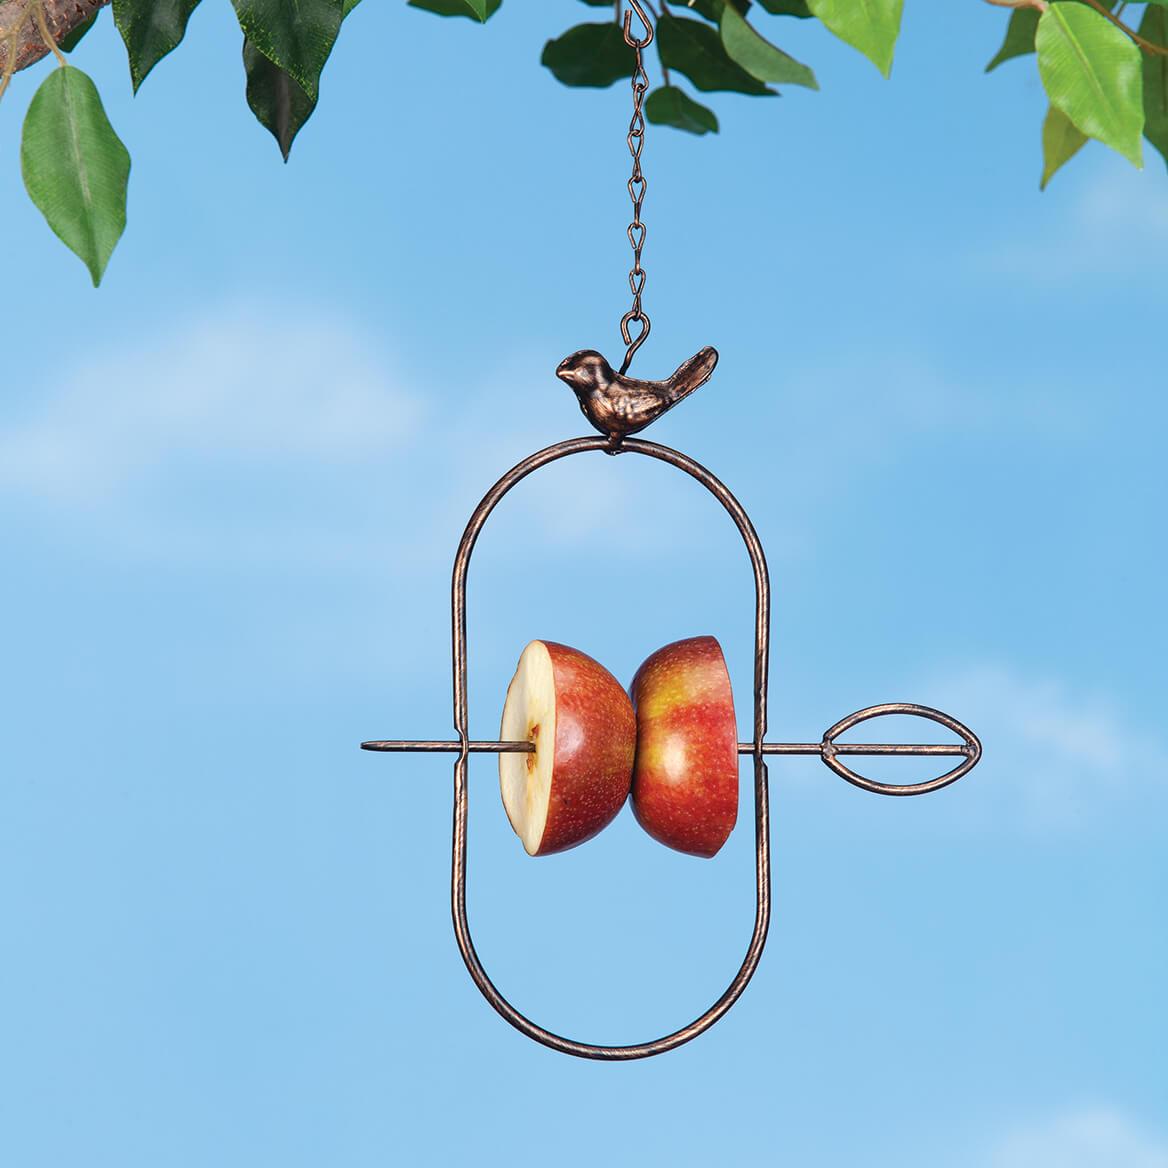 Metal Bird Fruit Feeder-371332